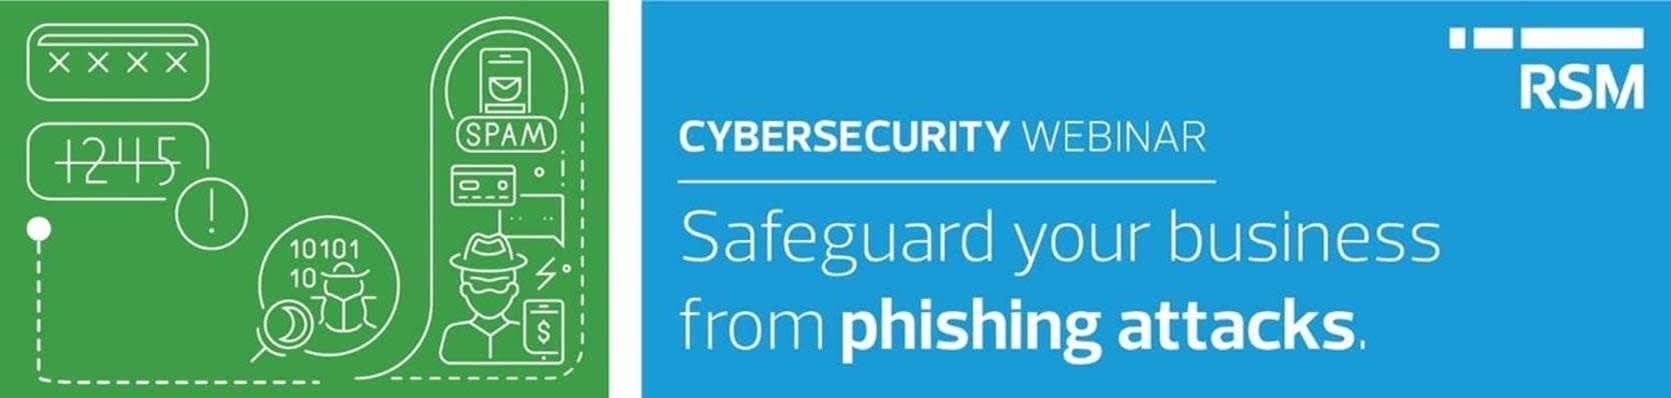 cybersecurity_webinar.jpg